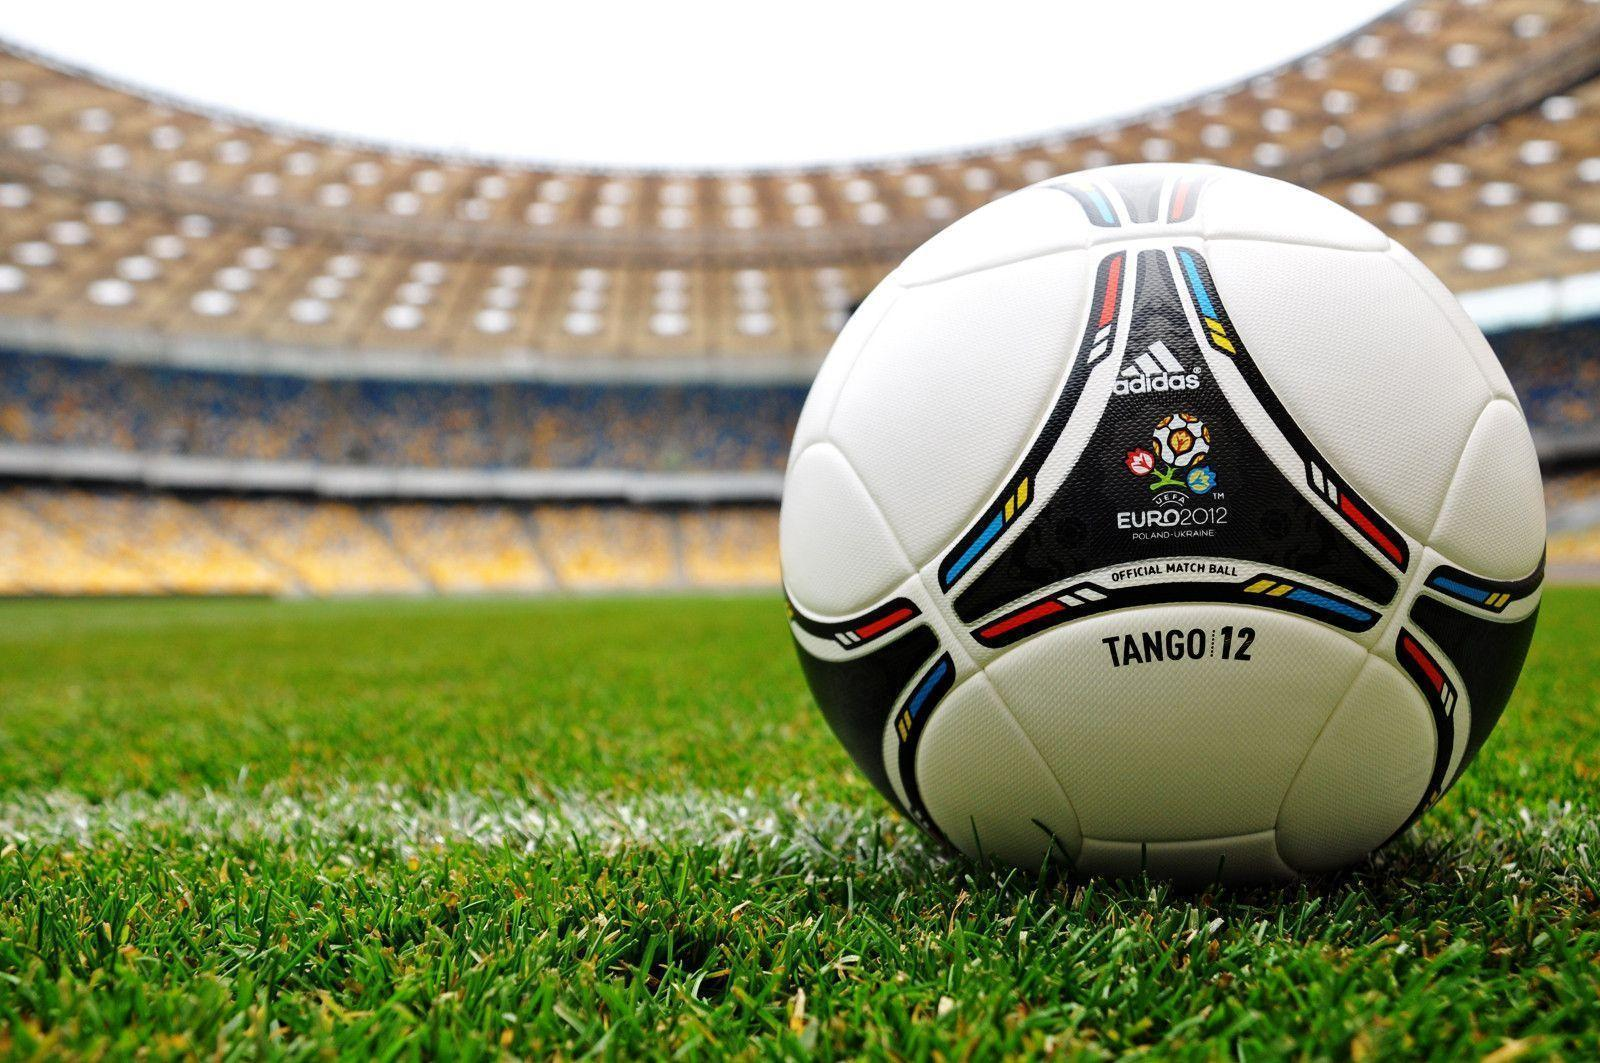 Champions League 2014-15 Tickets - UEFA Champions League Final ...